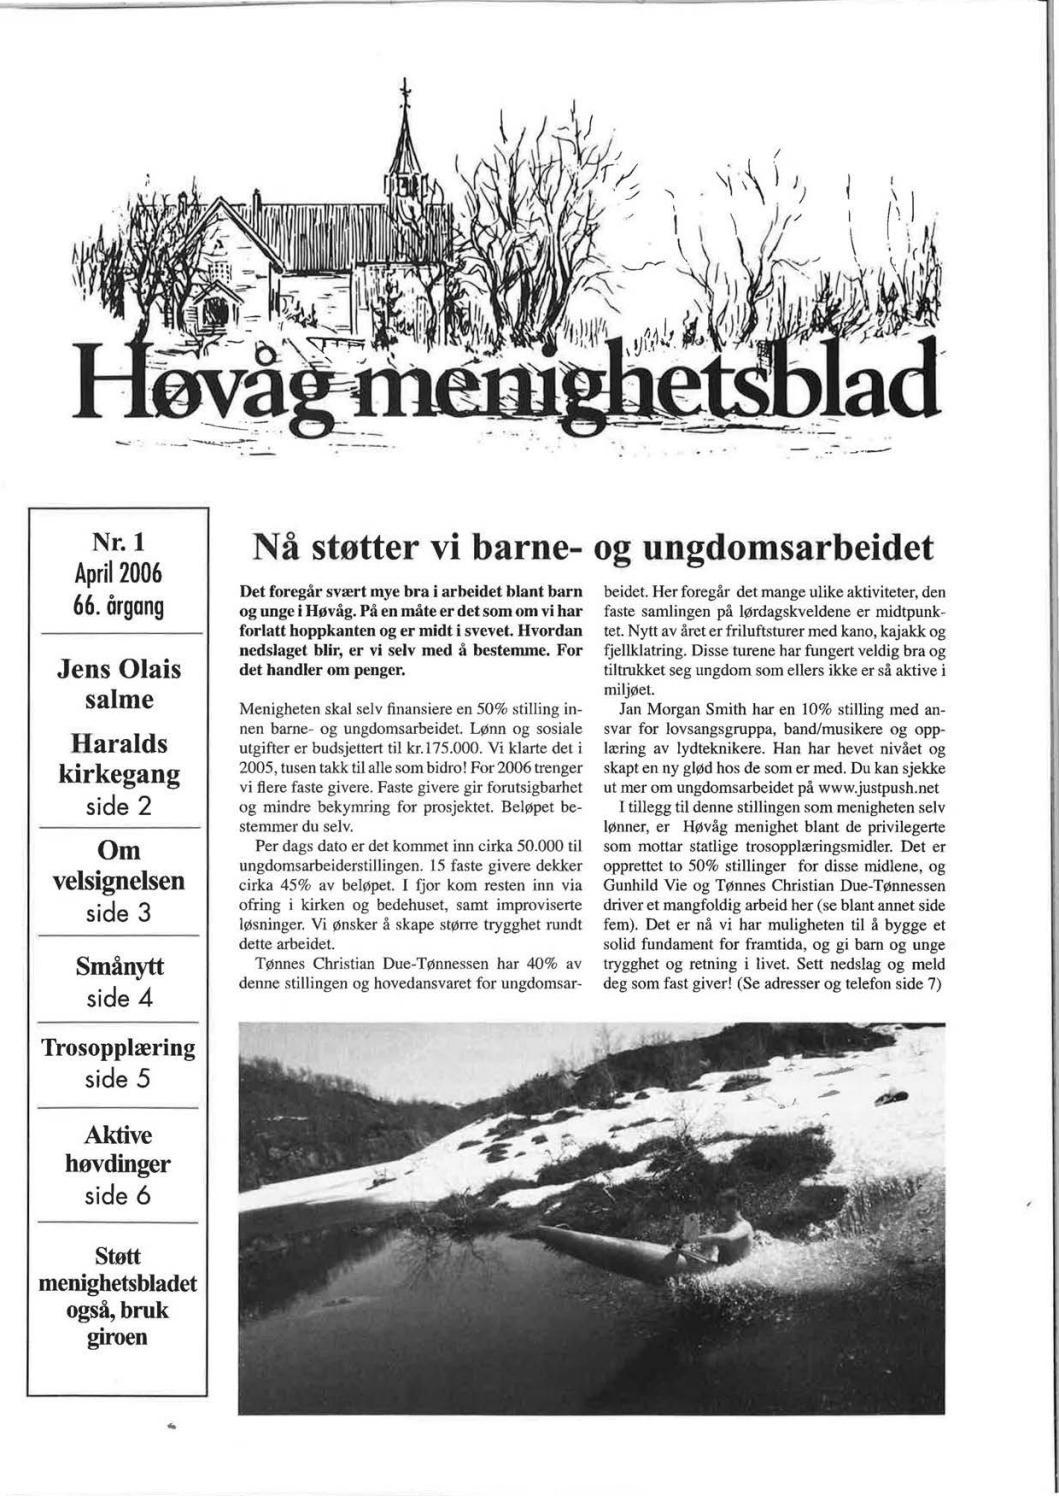 2214b734 Høvåg menighetsblad 2006 by Terje Skjerdal - issuu